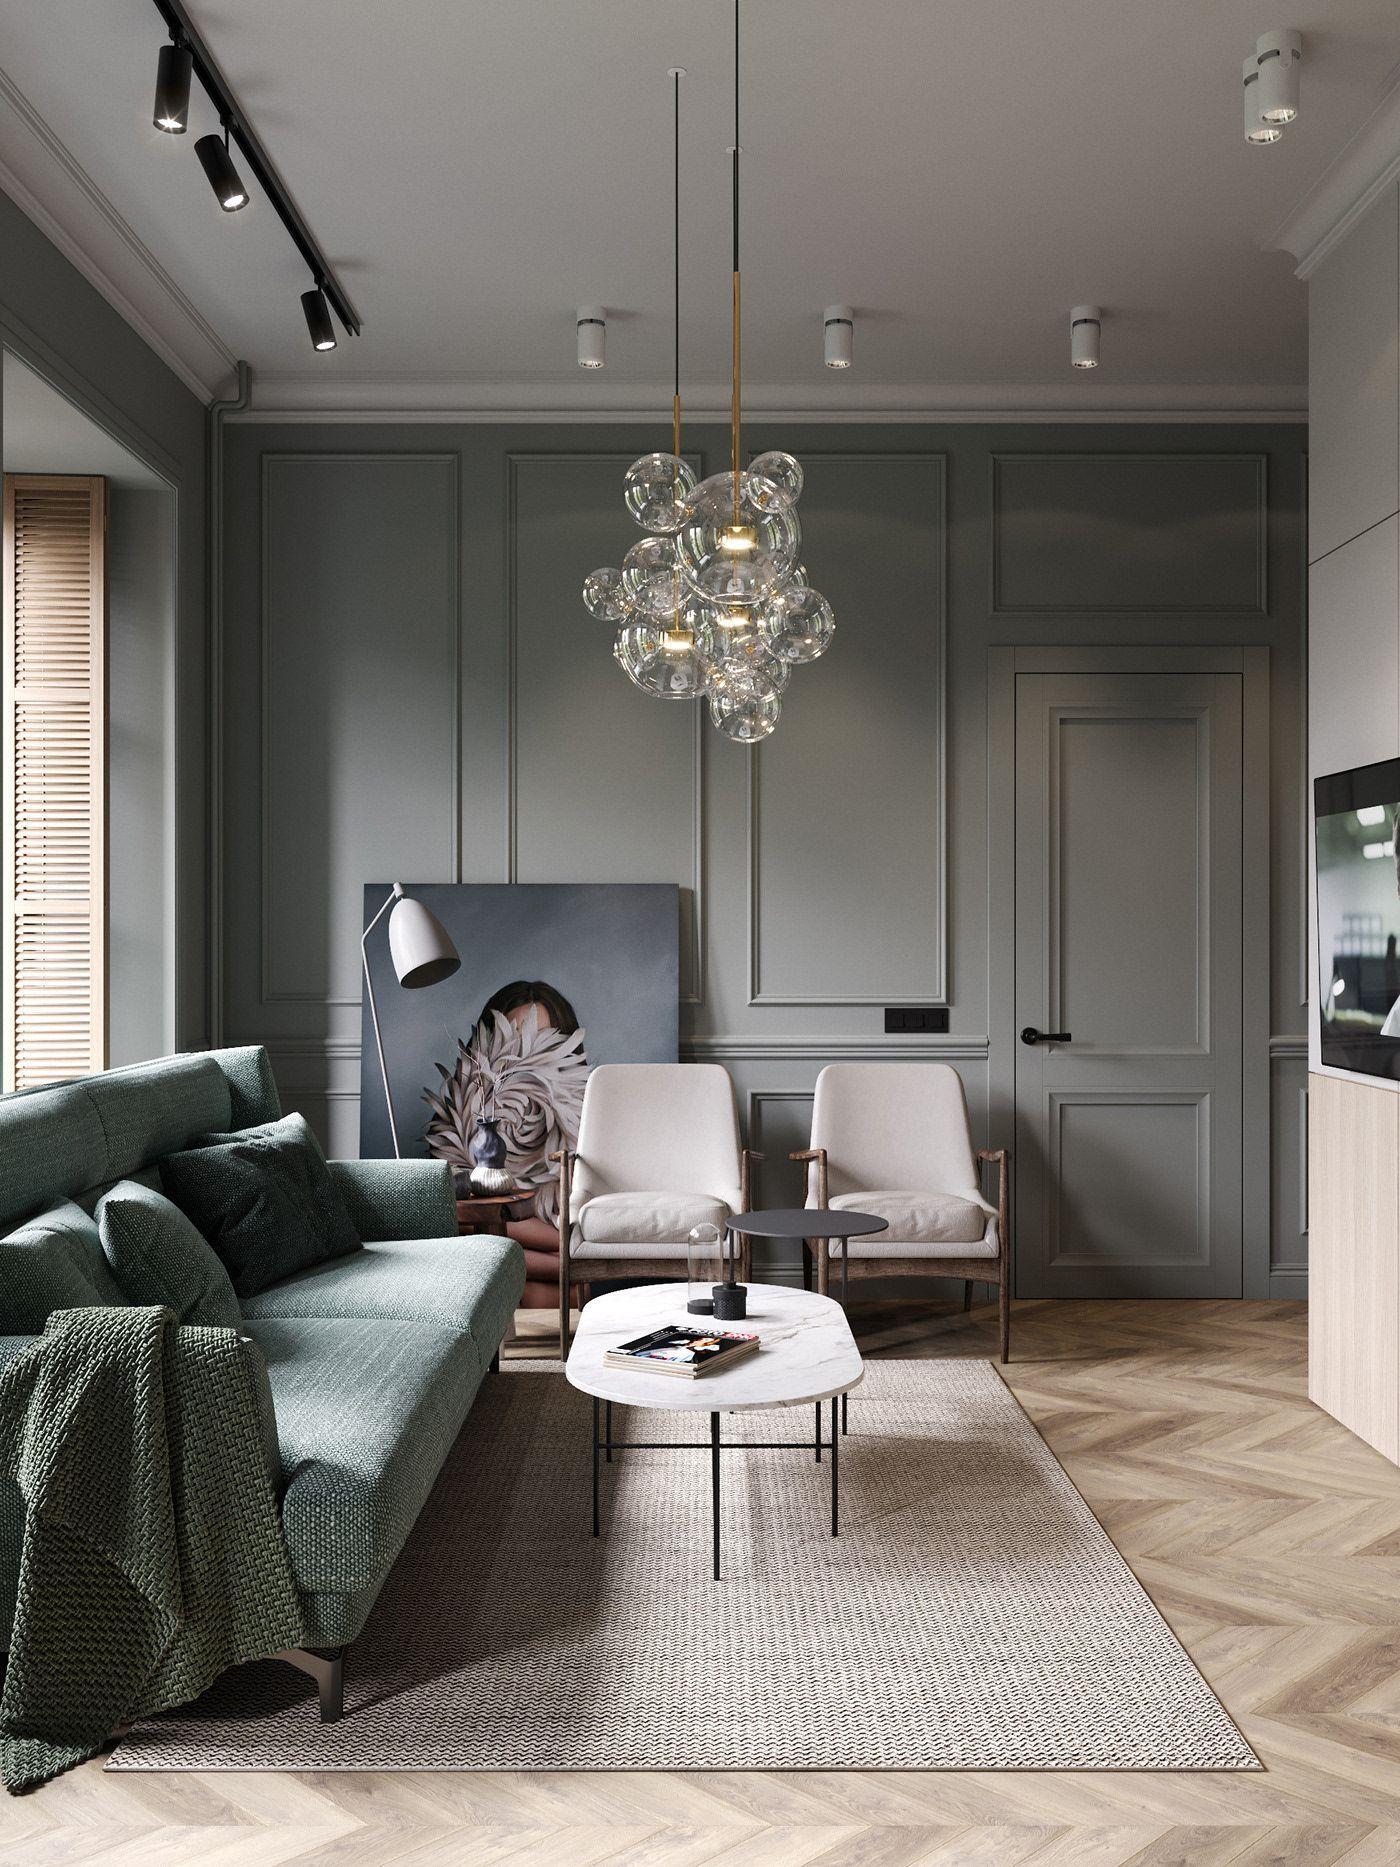 Best 28 Cozy Living Room Decor Ideas To Copy Apartment 400 x 300